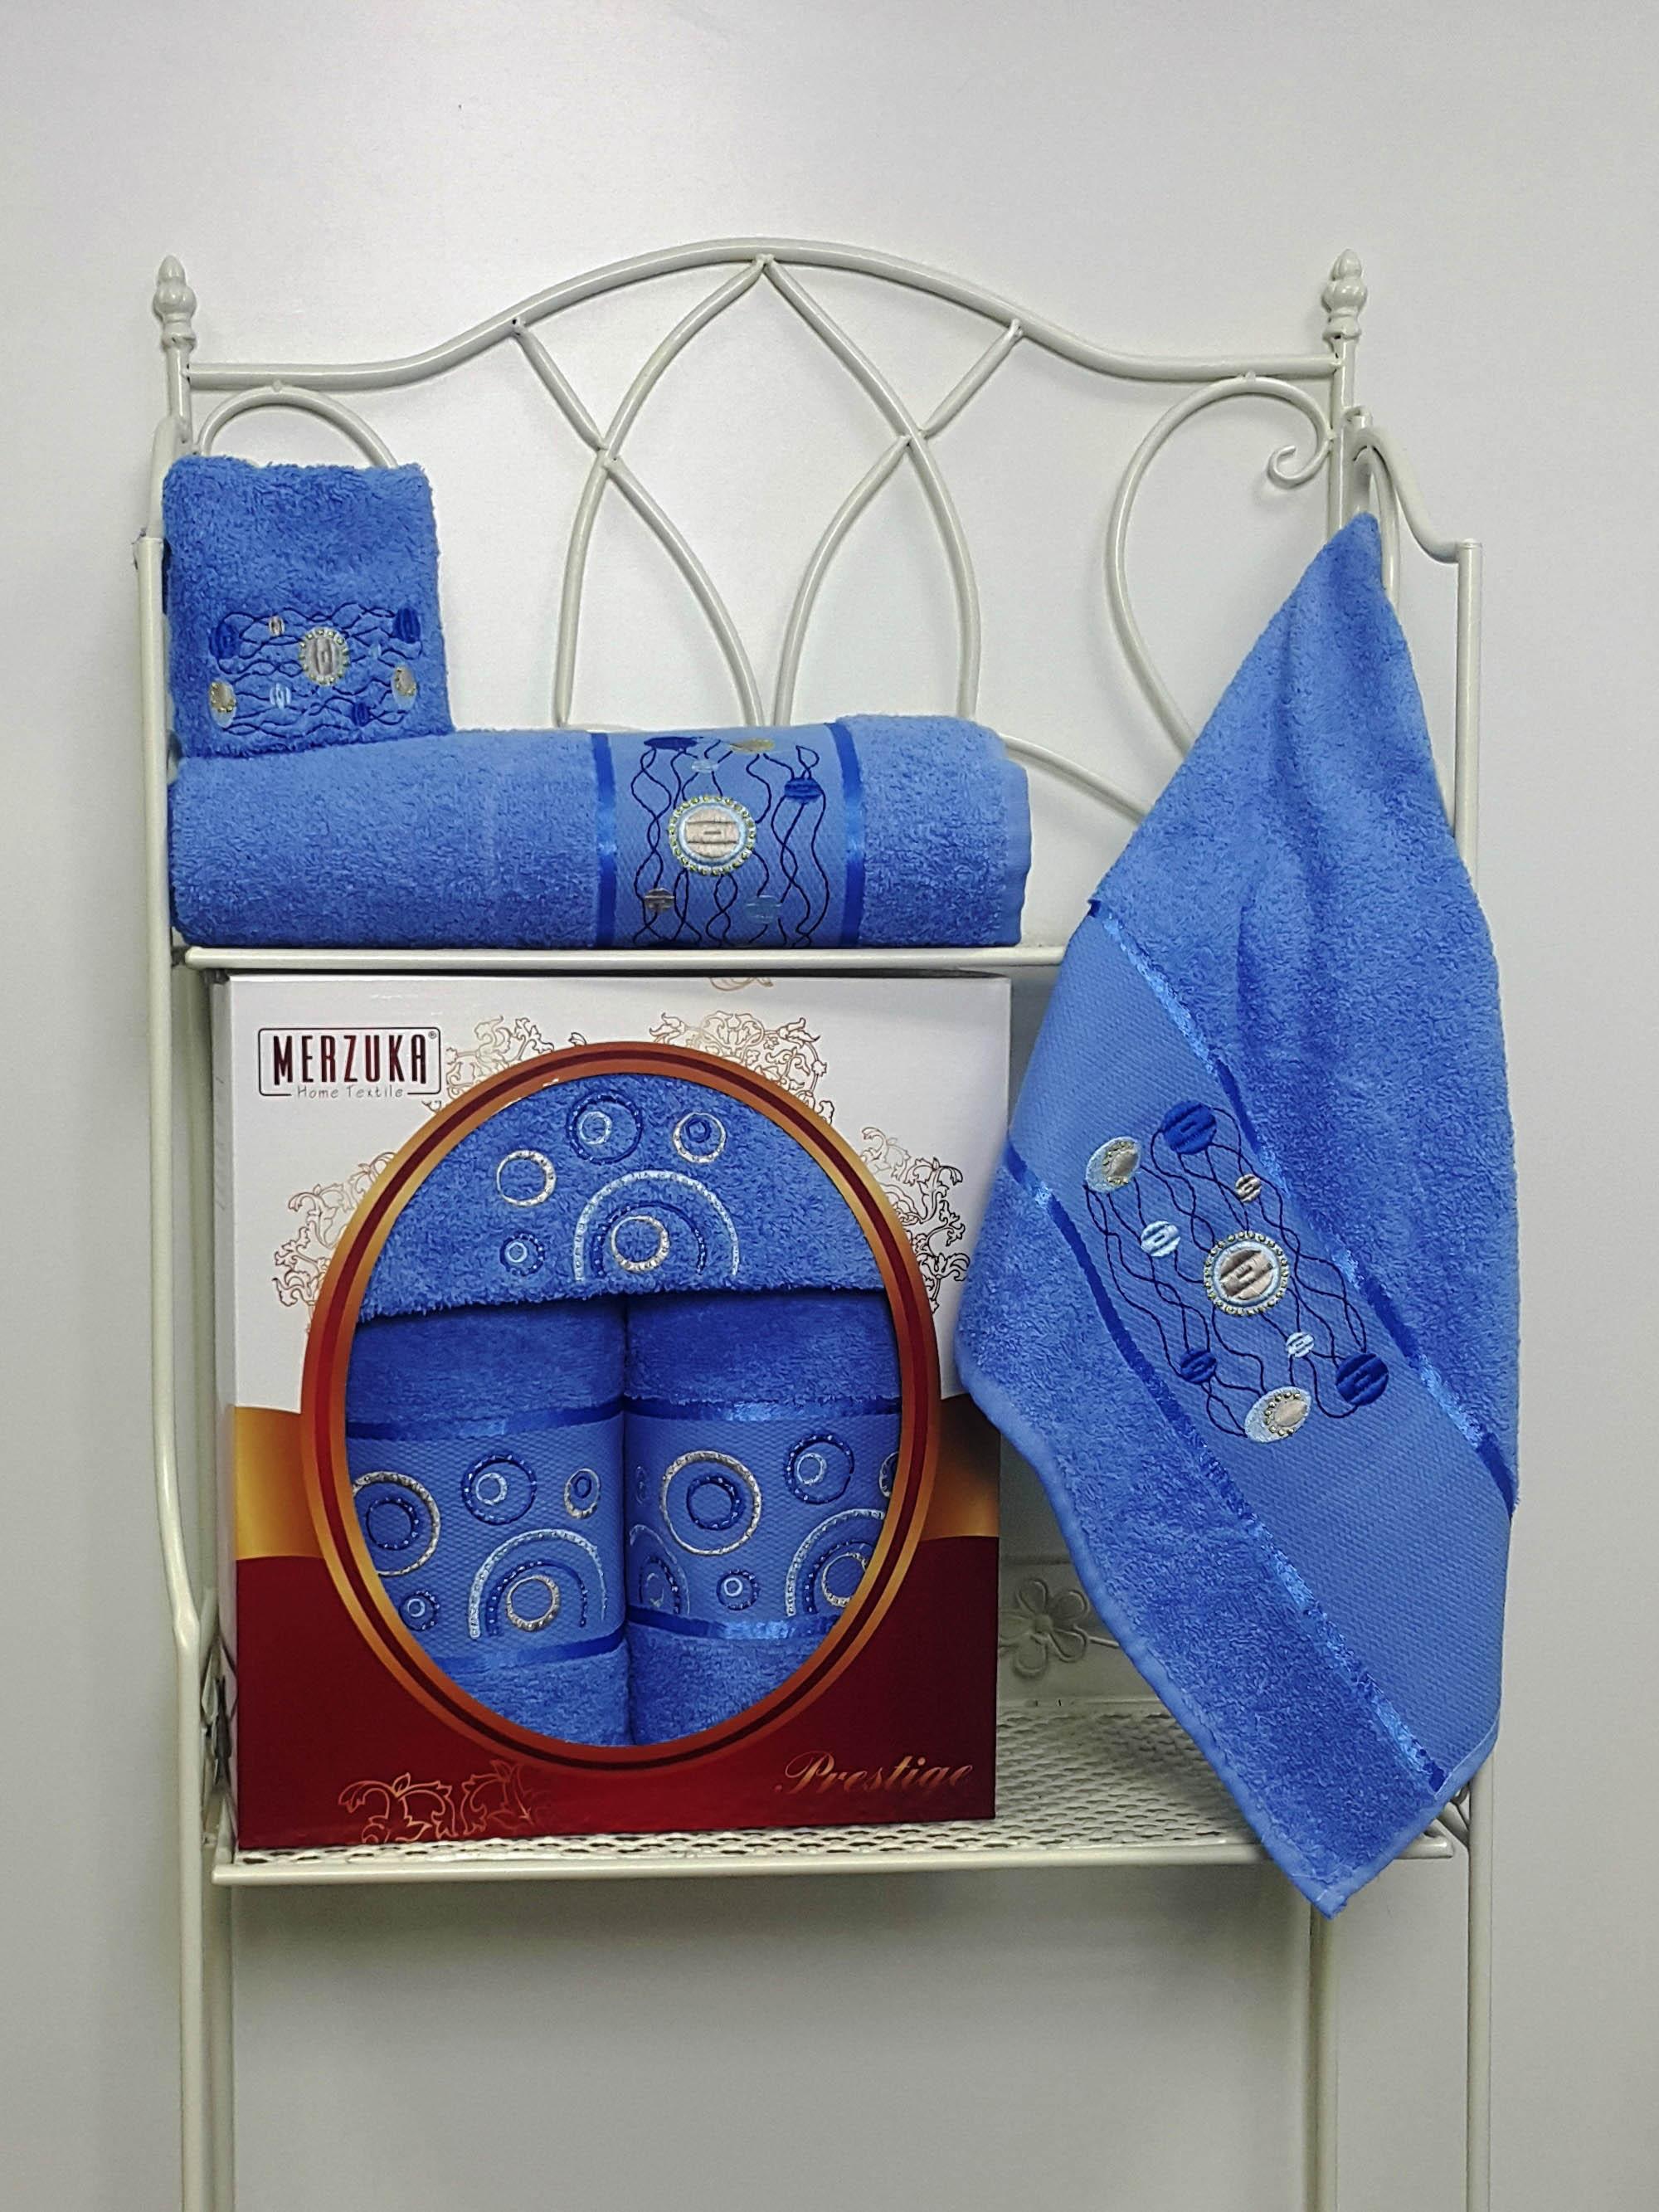 Полотенца Oran Merzuka Набор из 3 полотенец Prestij Цвет: Голубой набор из 3 полотенец merzuka sakura 50х90 2 70х140 8432 оранжевый